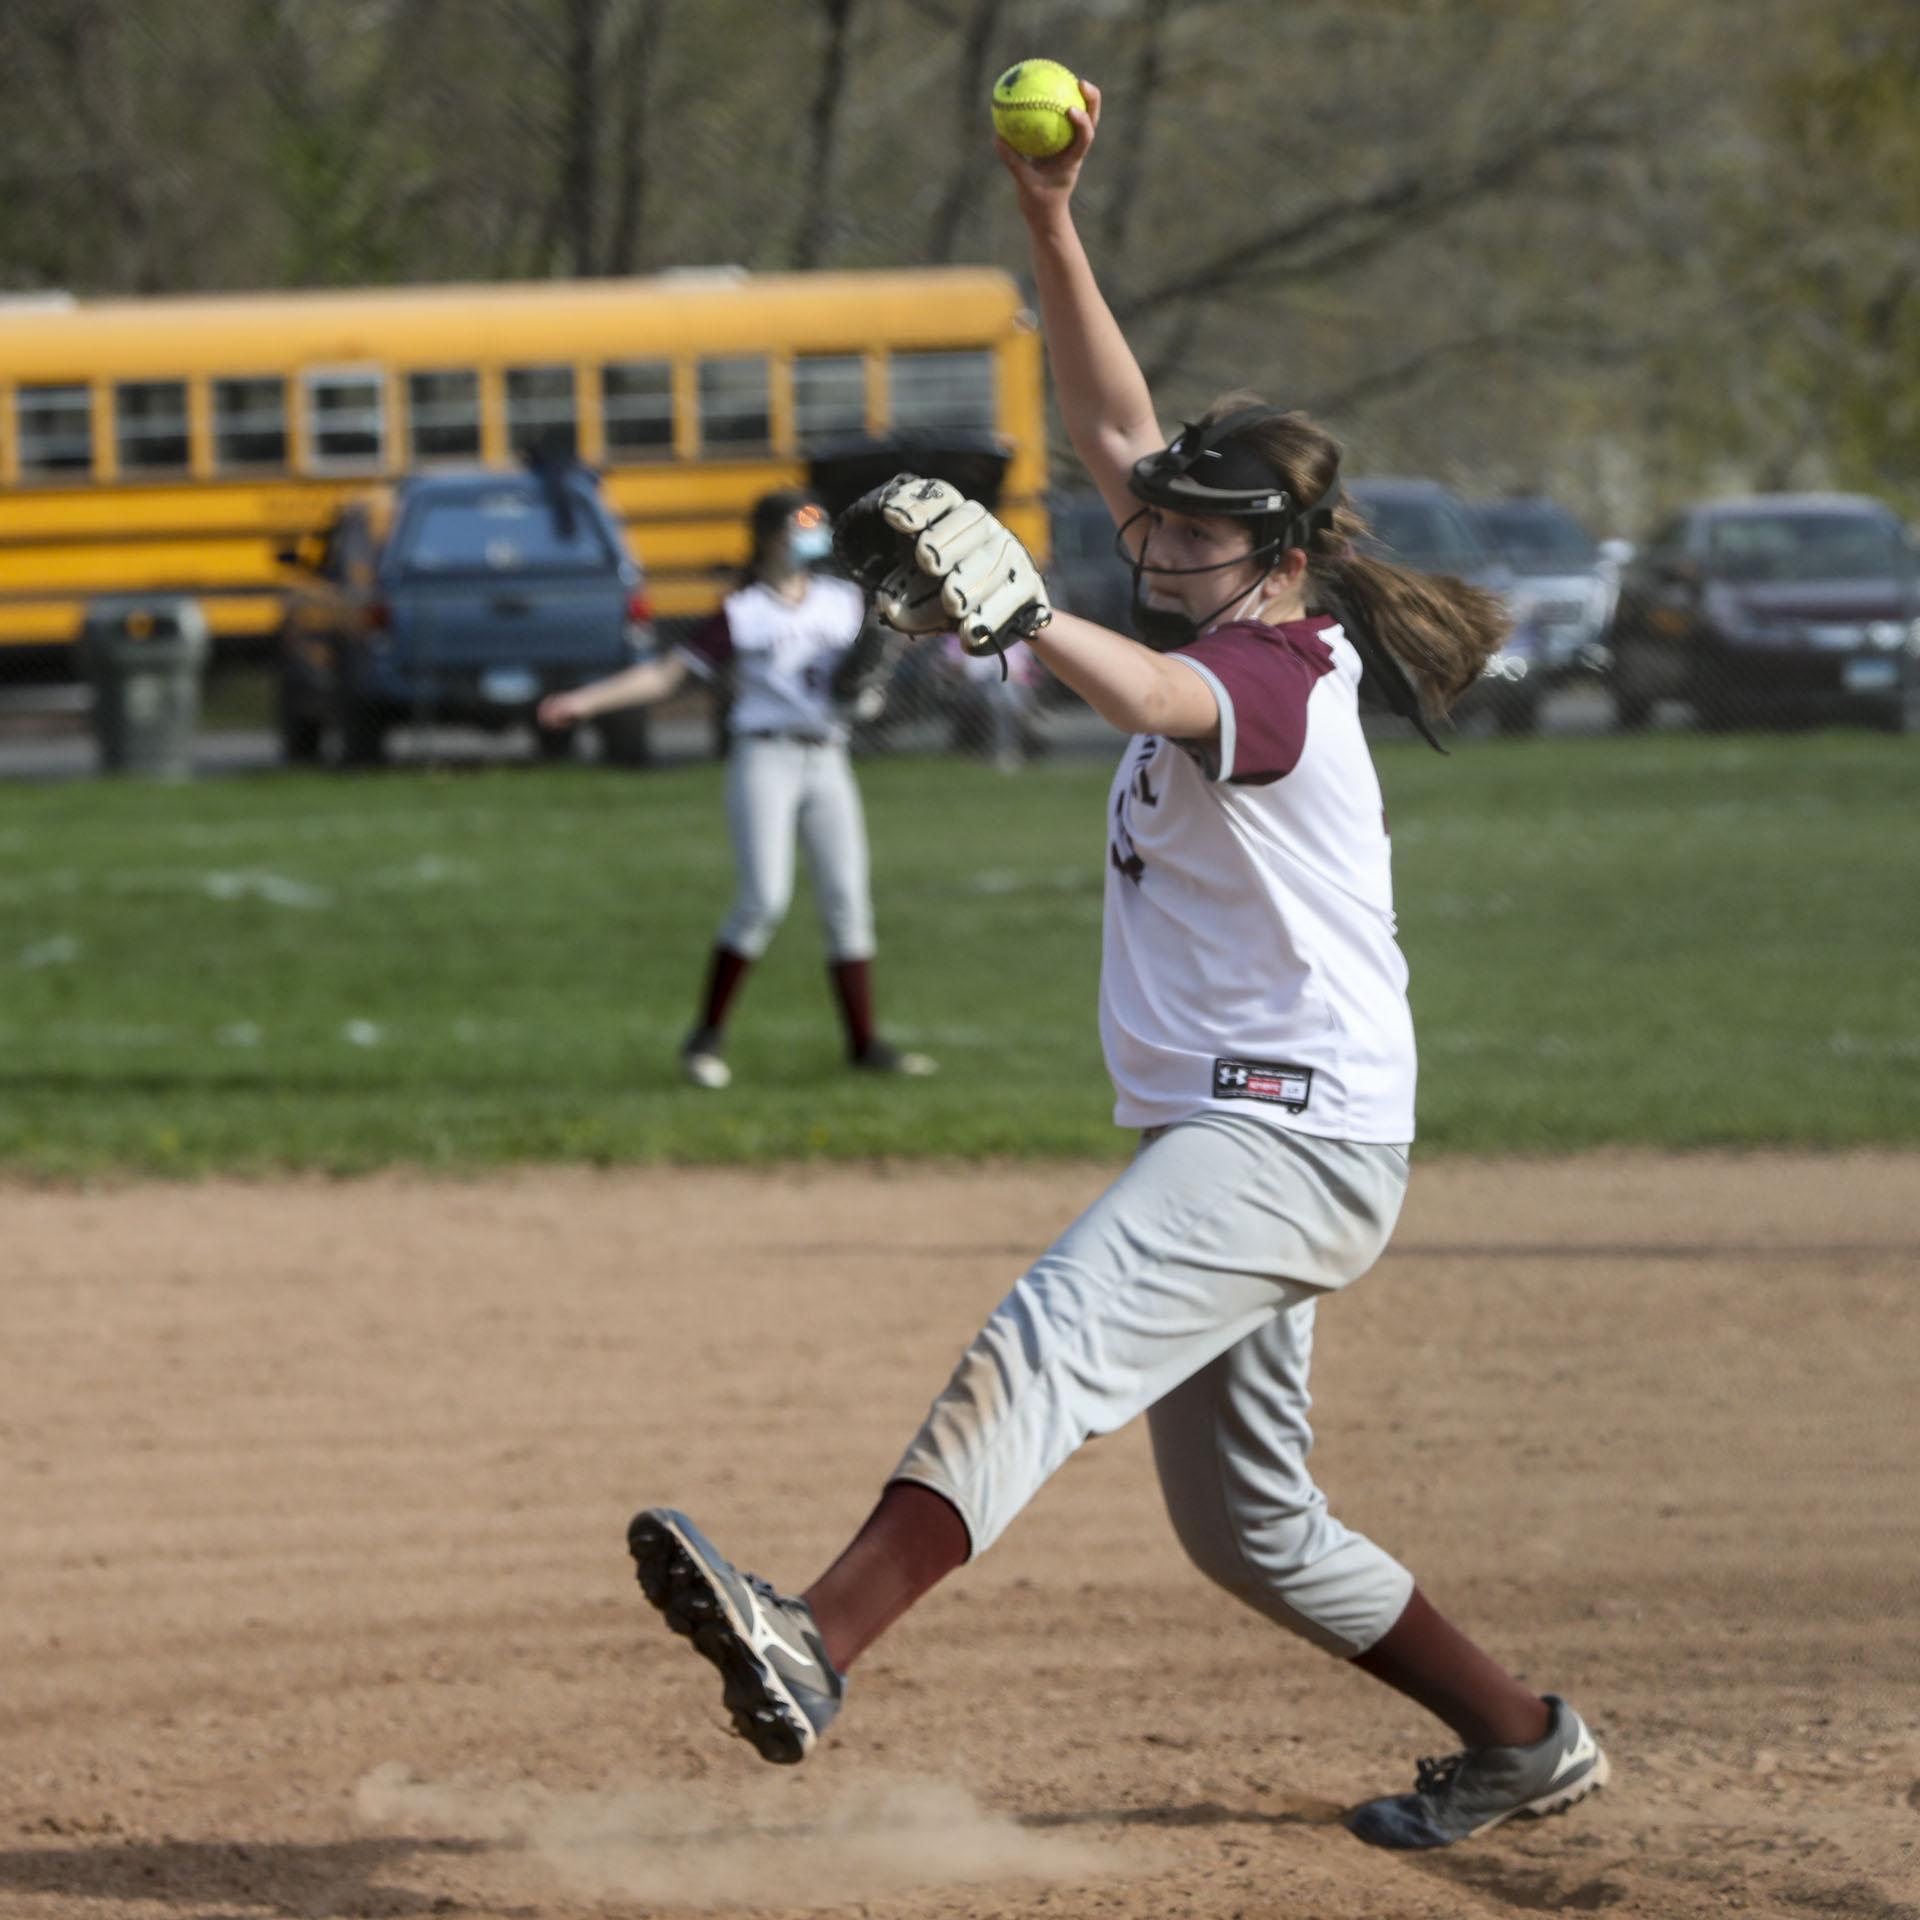 Softball player pitching the ball